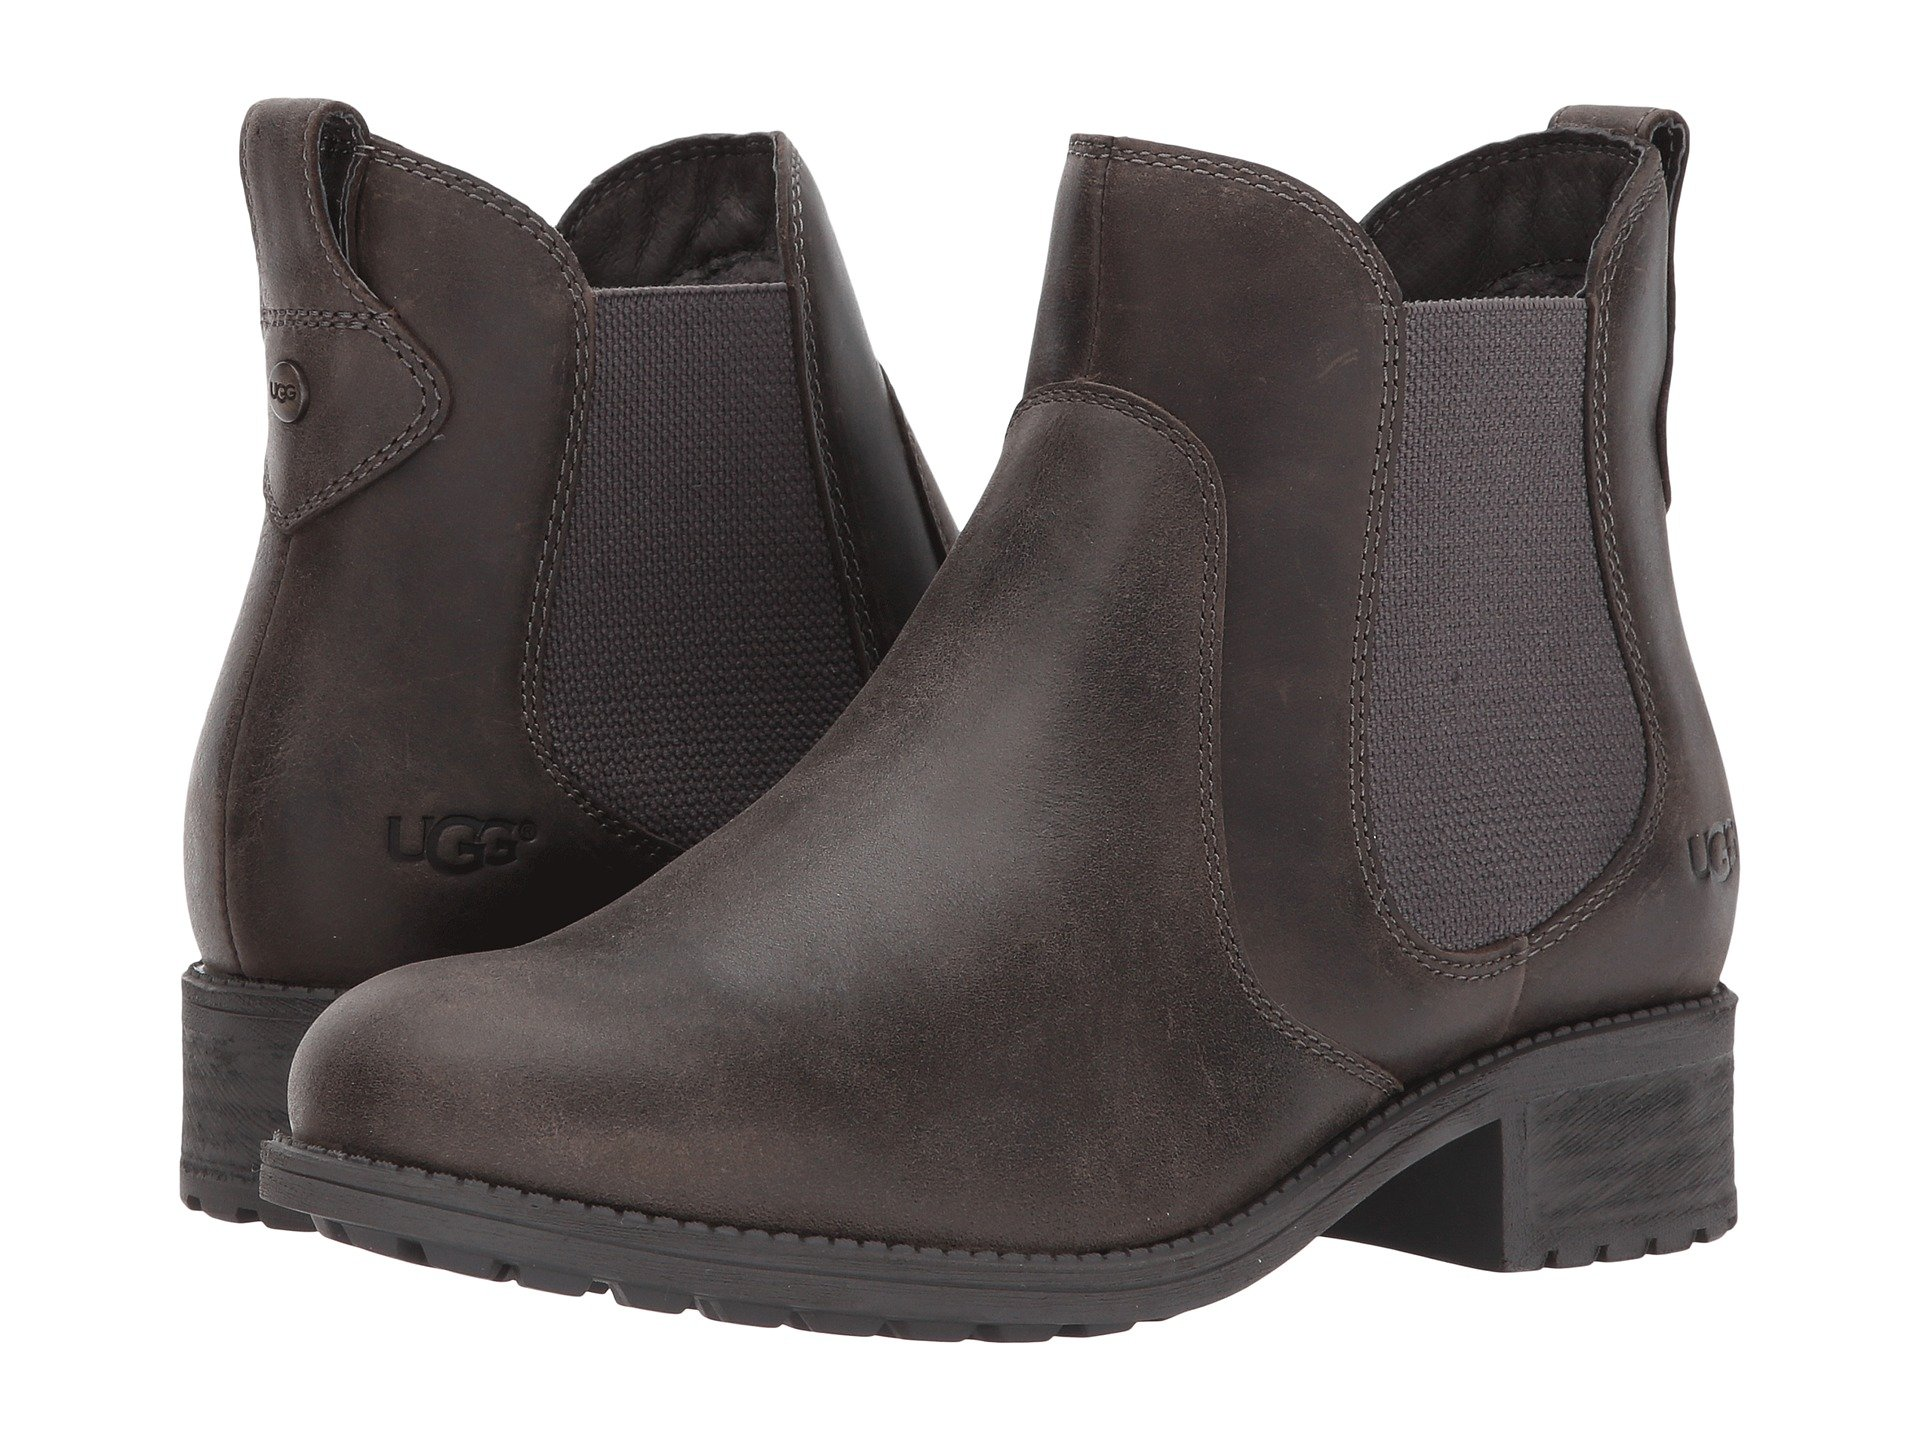 UGG Bonham (Grey) Women's Boots